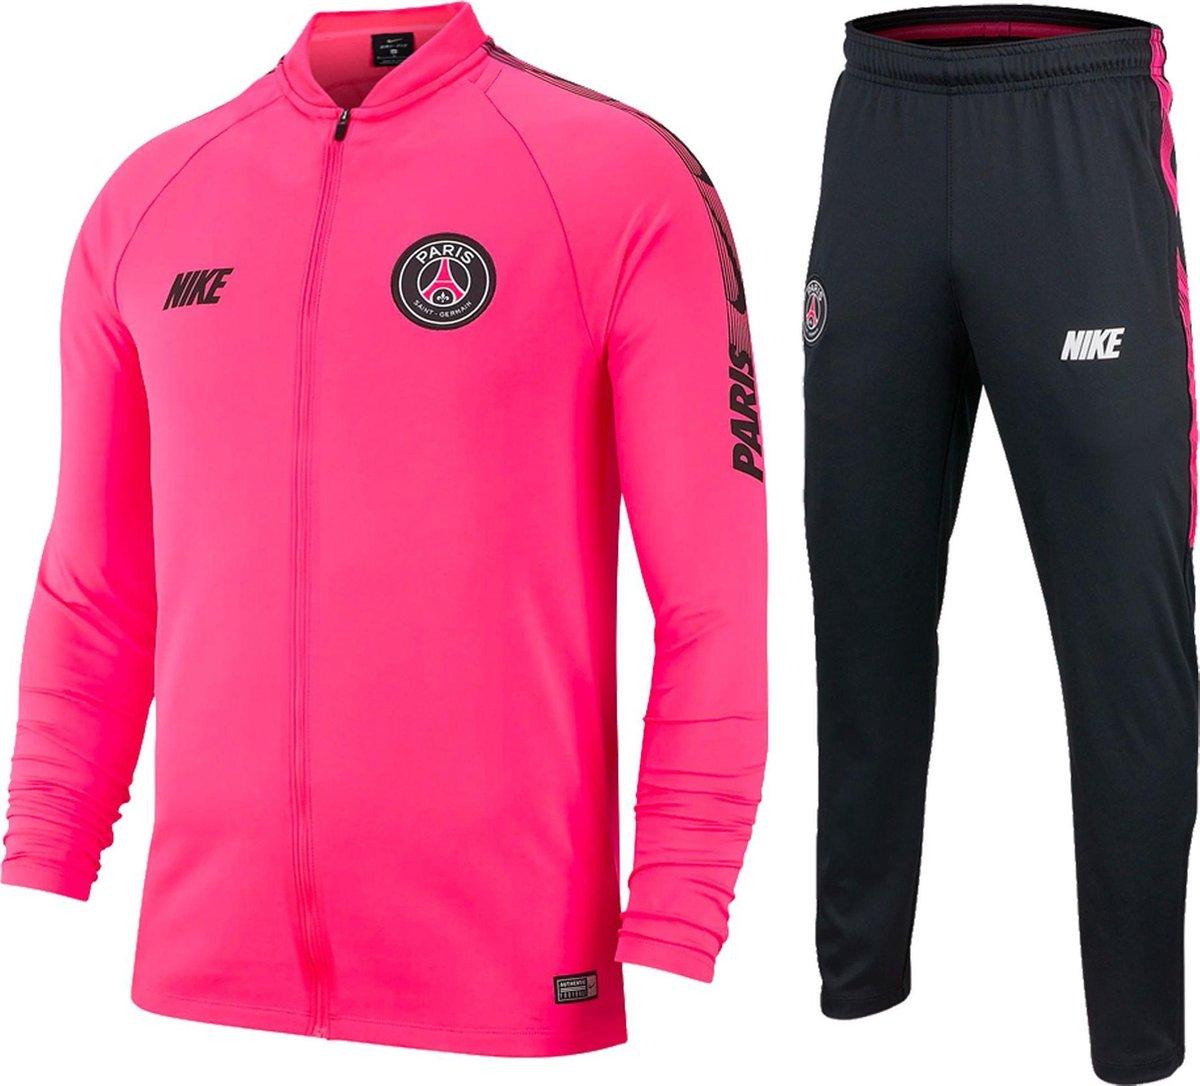 bol.com | Nike Dry PSG Trainingspak - Maat M - Mannen - roze ...